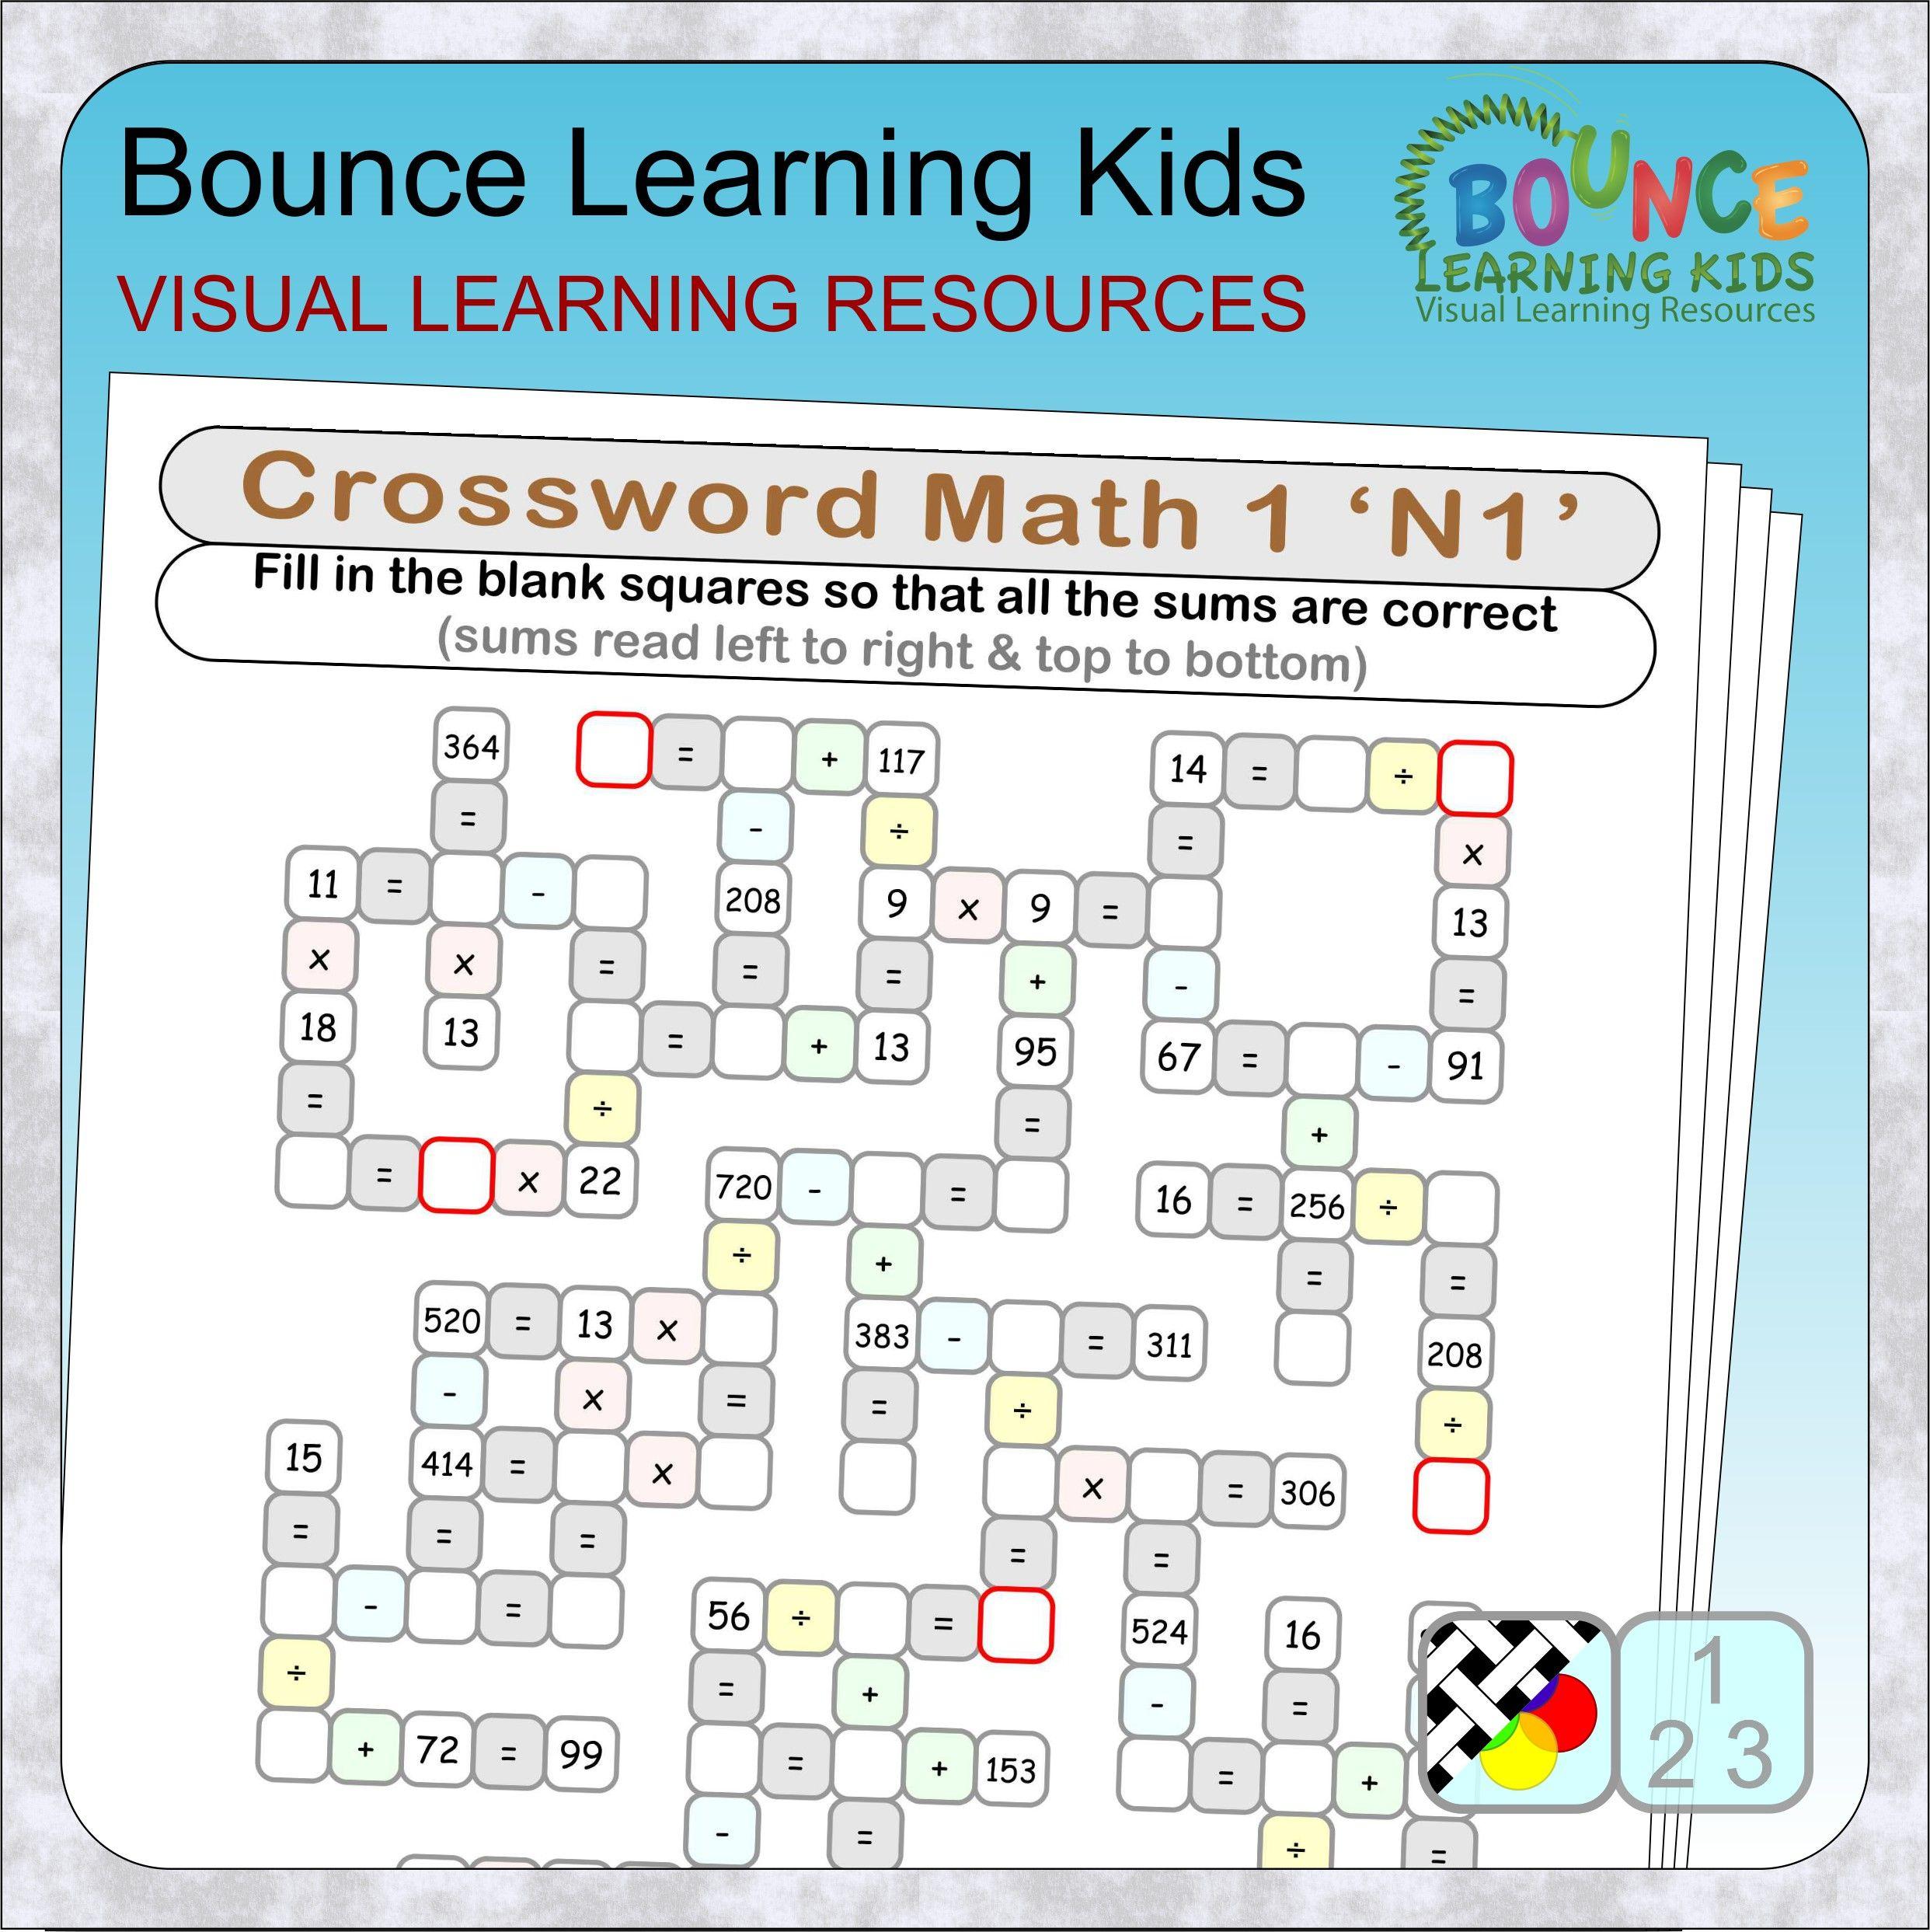 Crossword Math 1 Maths Puzzles Maths Sums Learning Math